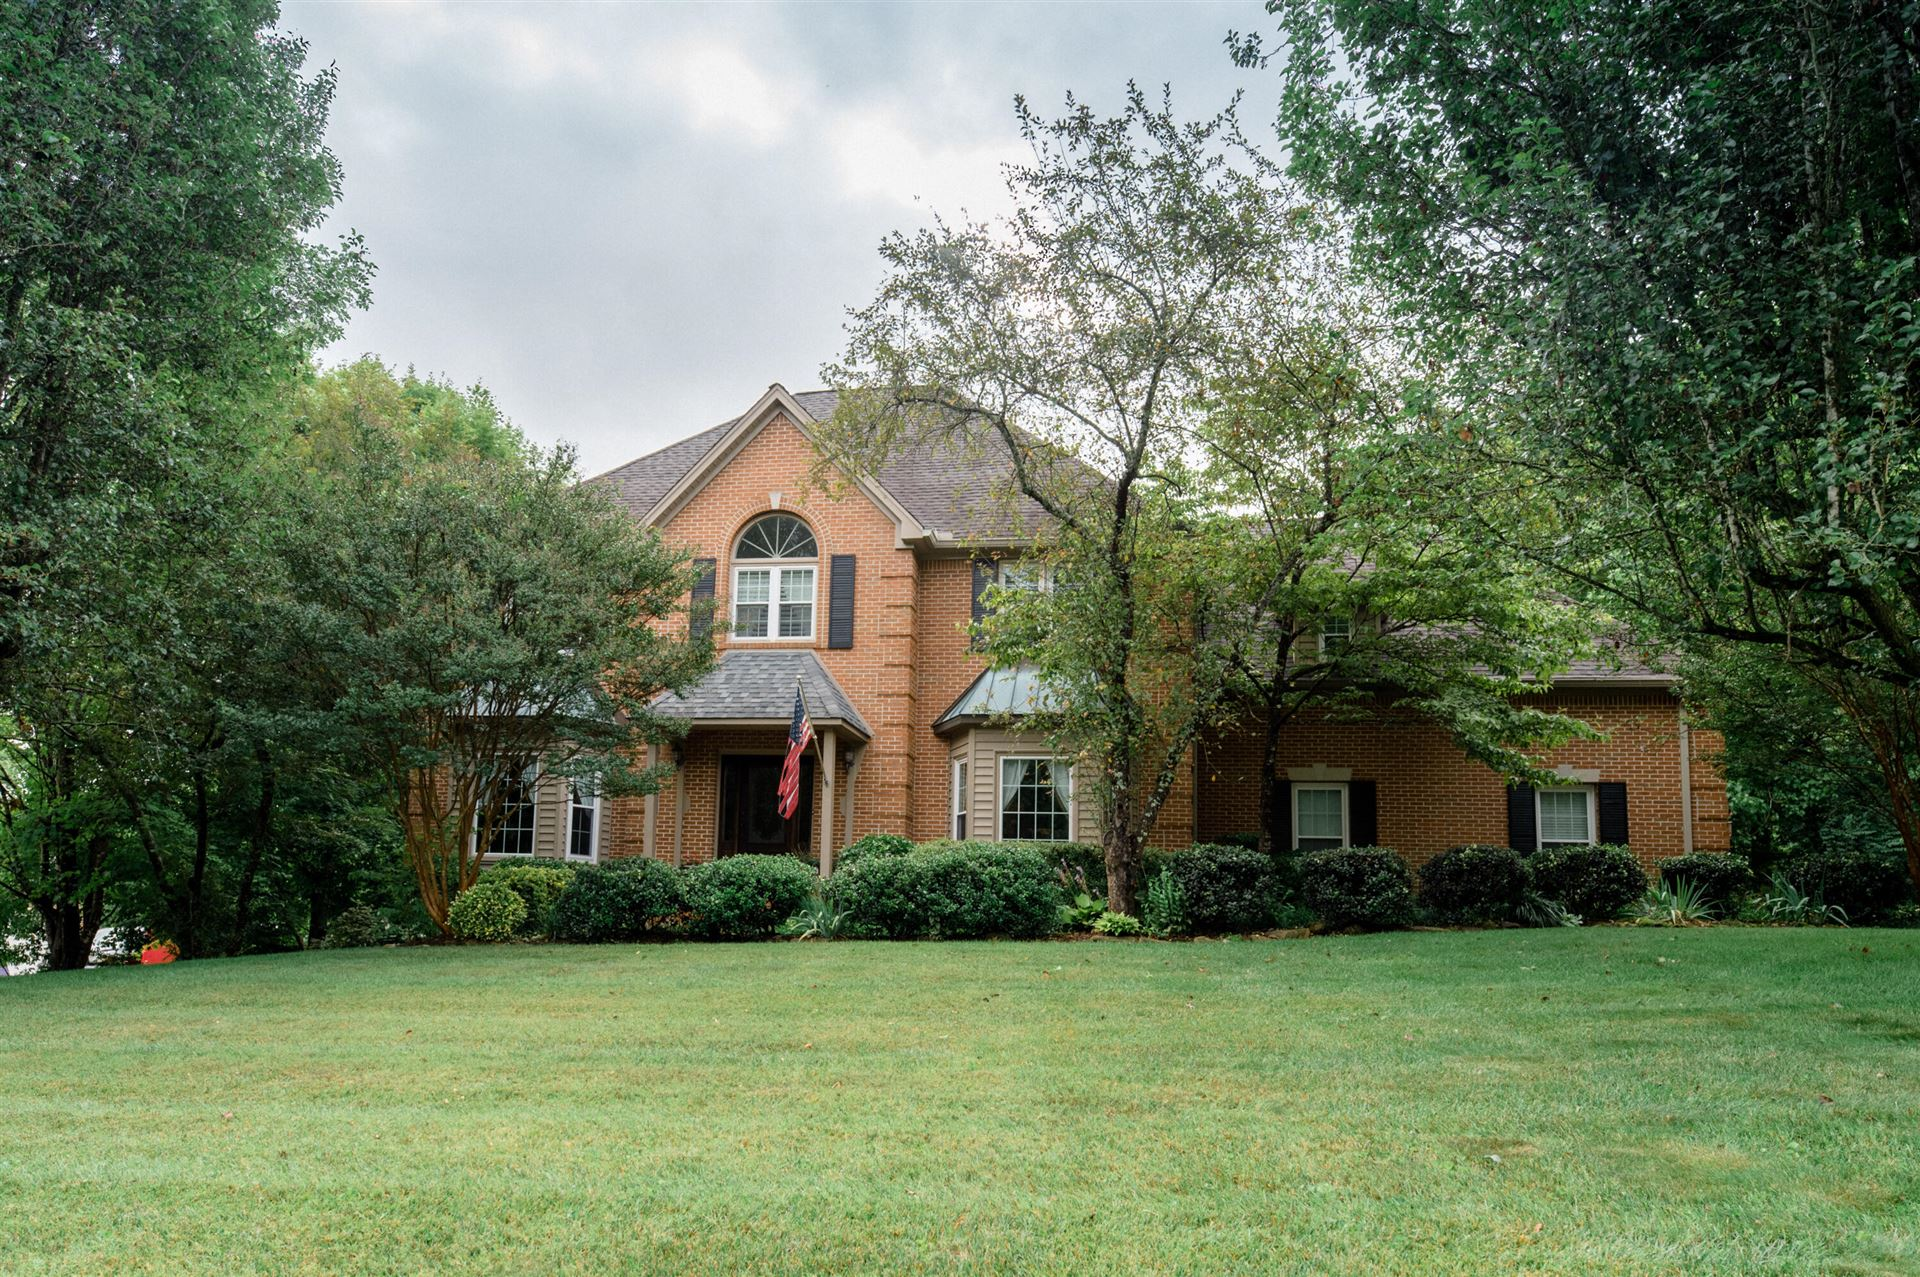 Photo of 113 Danbury Drive, Oak Ridge, TN 37830 (MLS # 1160135)